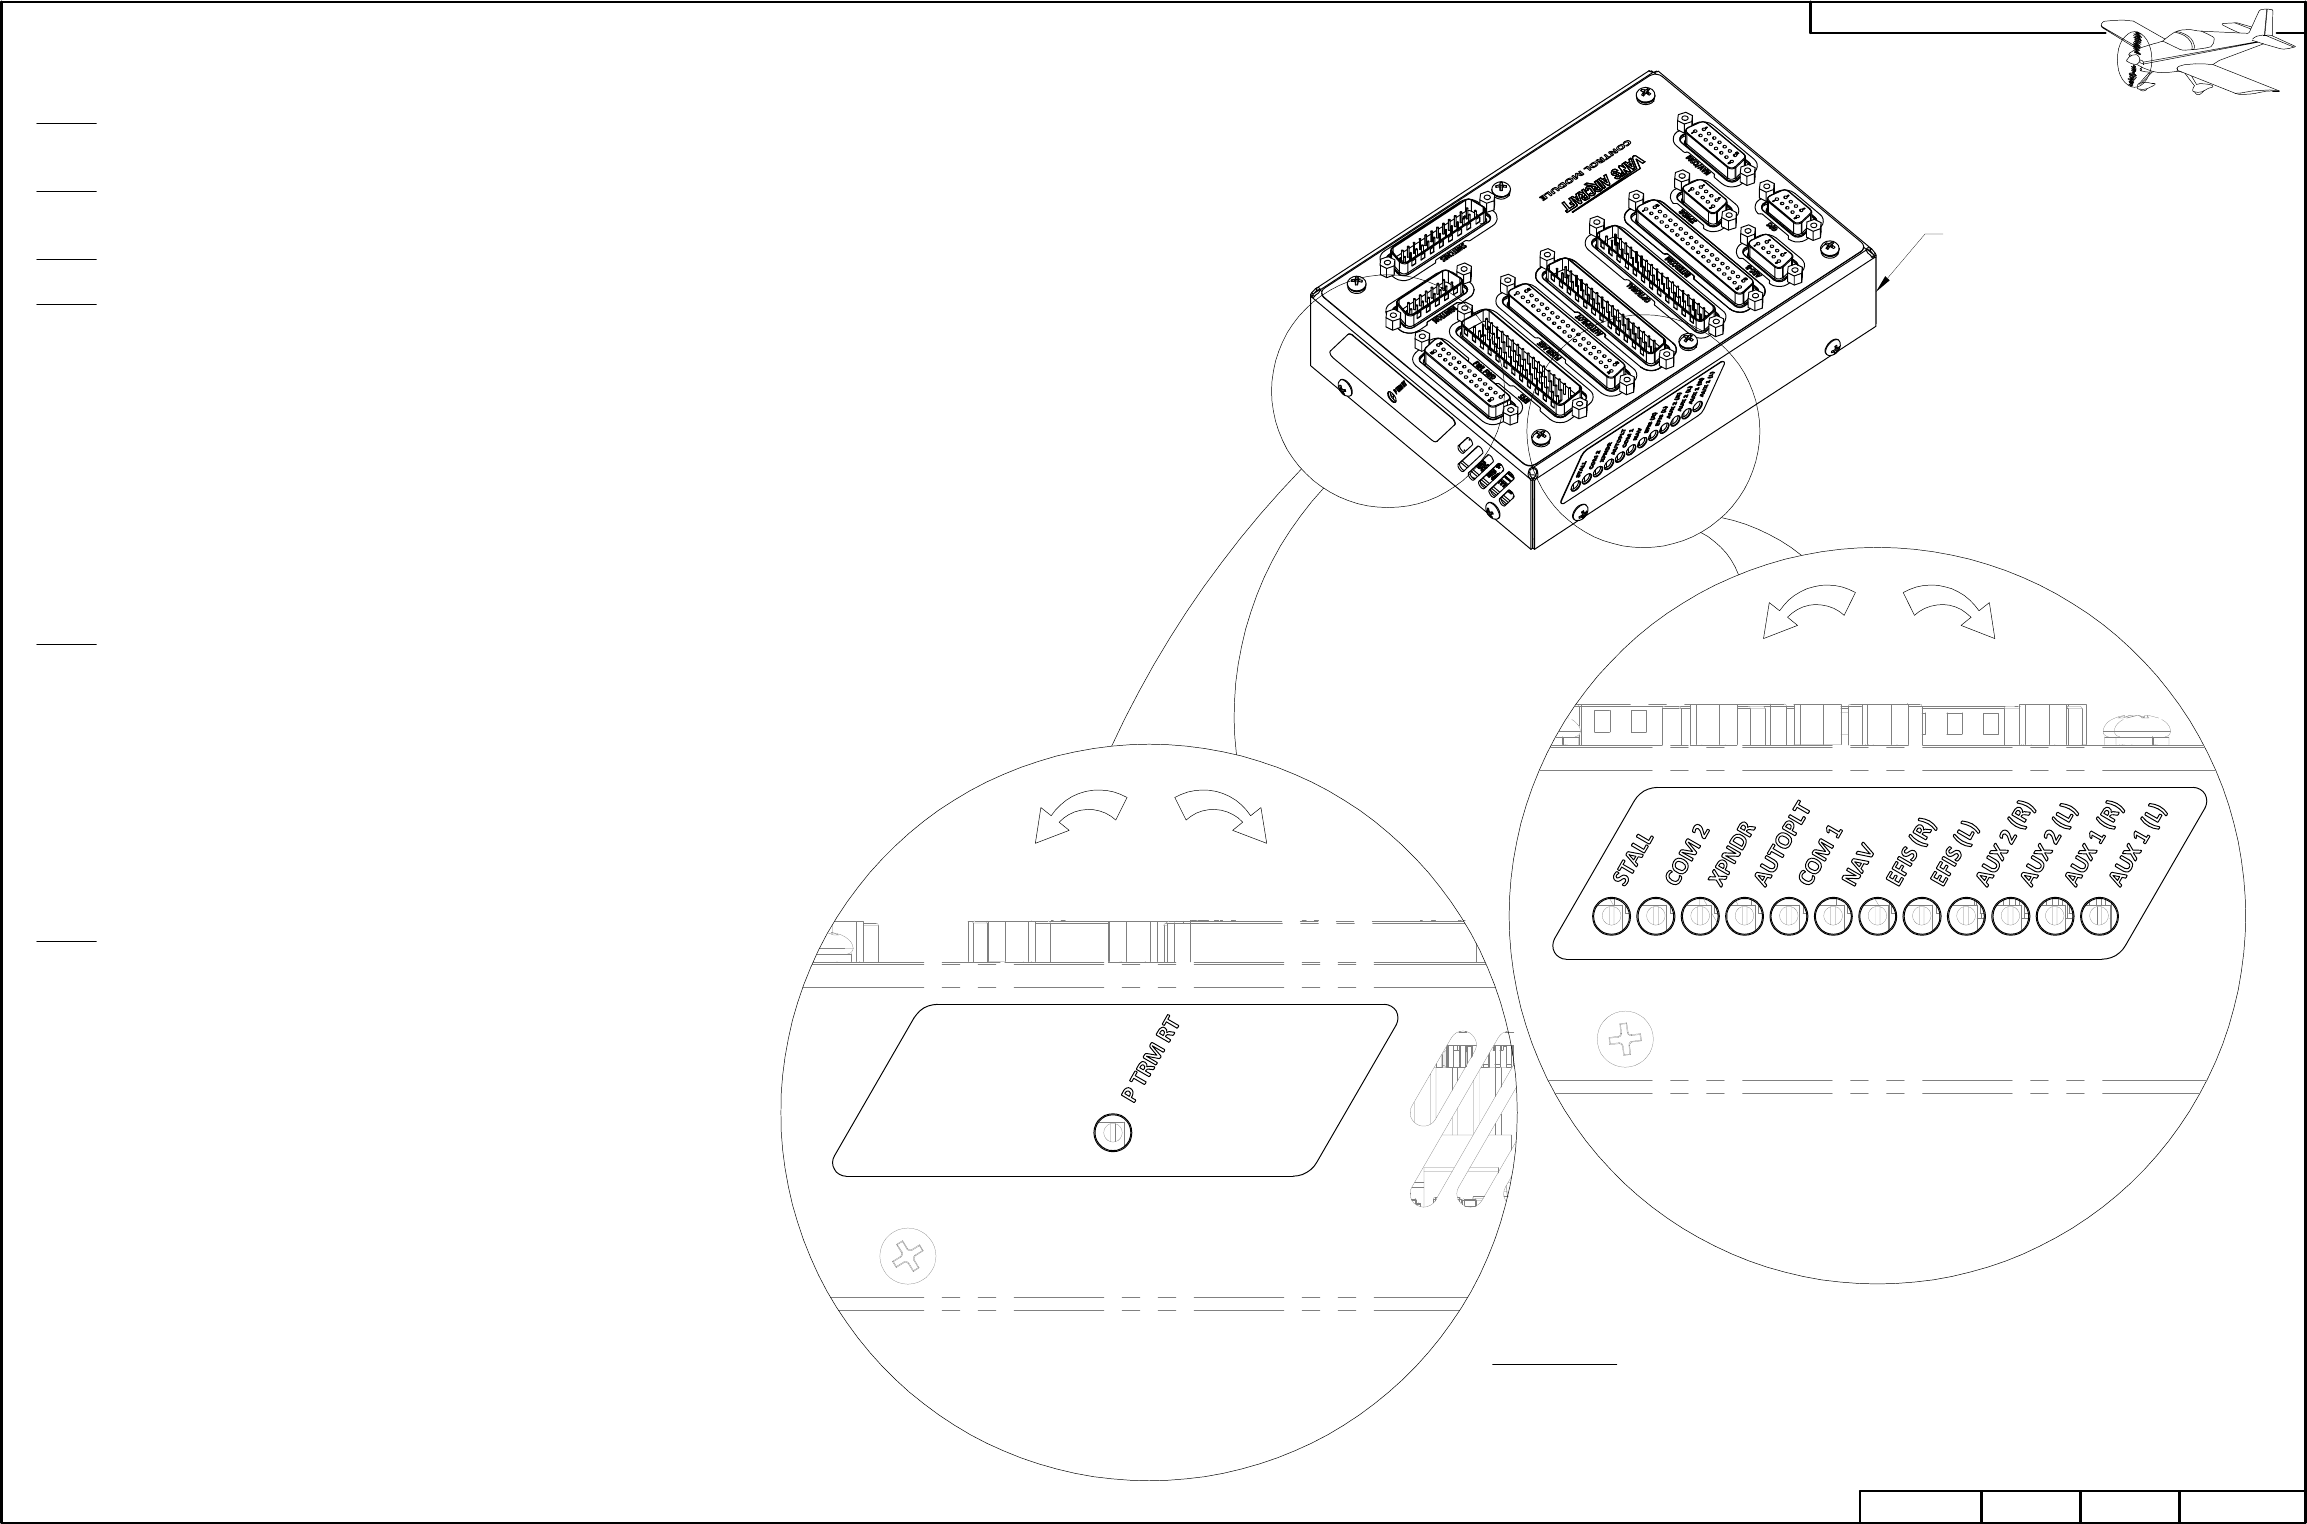 wiring a microphone wiring diagram database Astatic Mic Wiring Guide headphone microphone jack wiring diagram wiring diagram database wiring a switch aviation headset jack wiring wiring